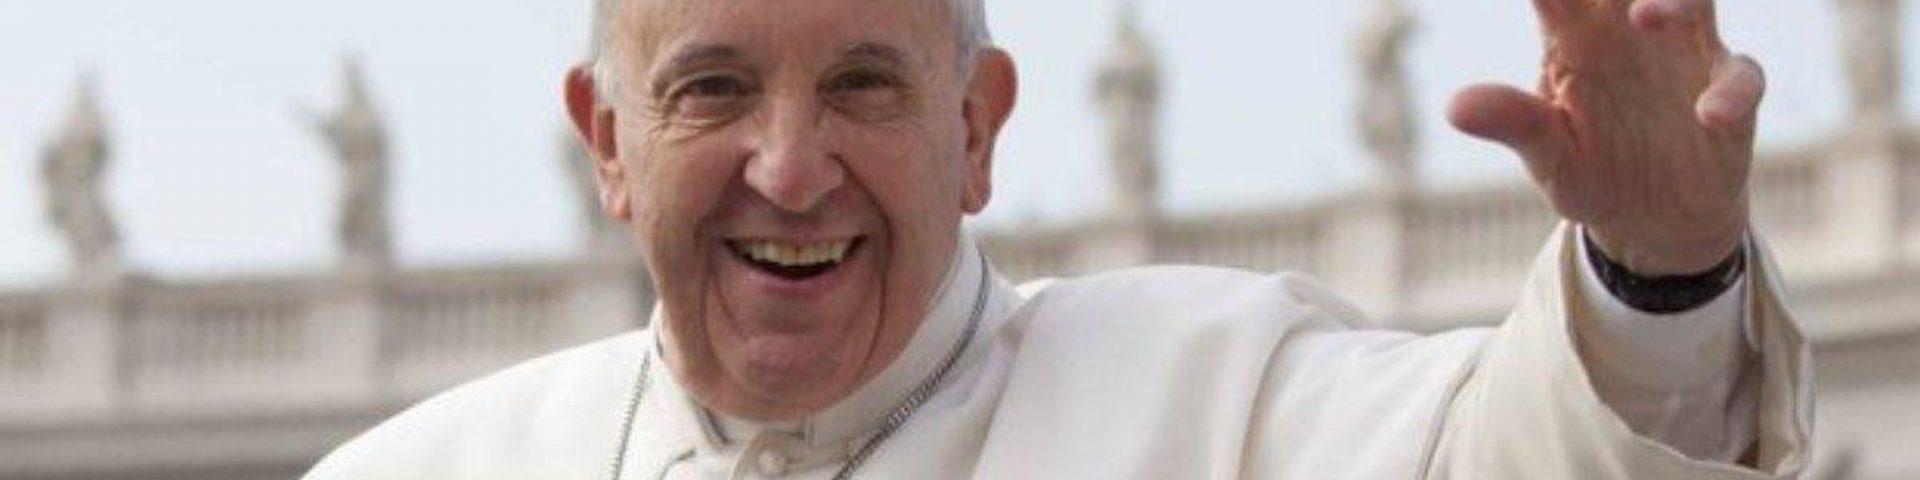 Papa Francesco, una nuova docu-serie su Netflix